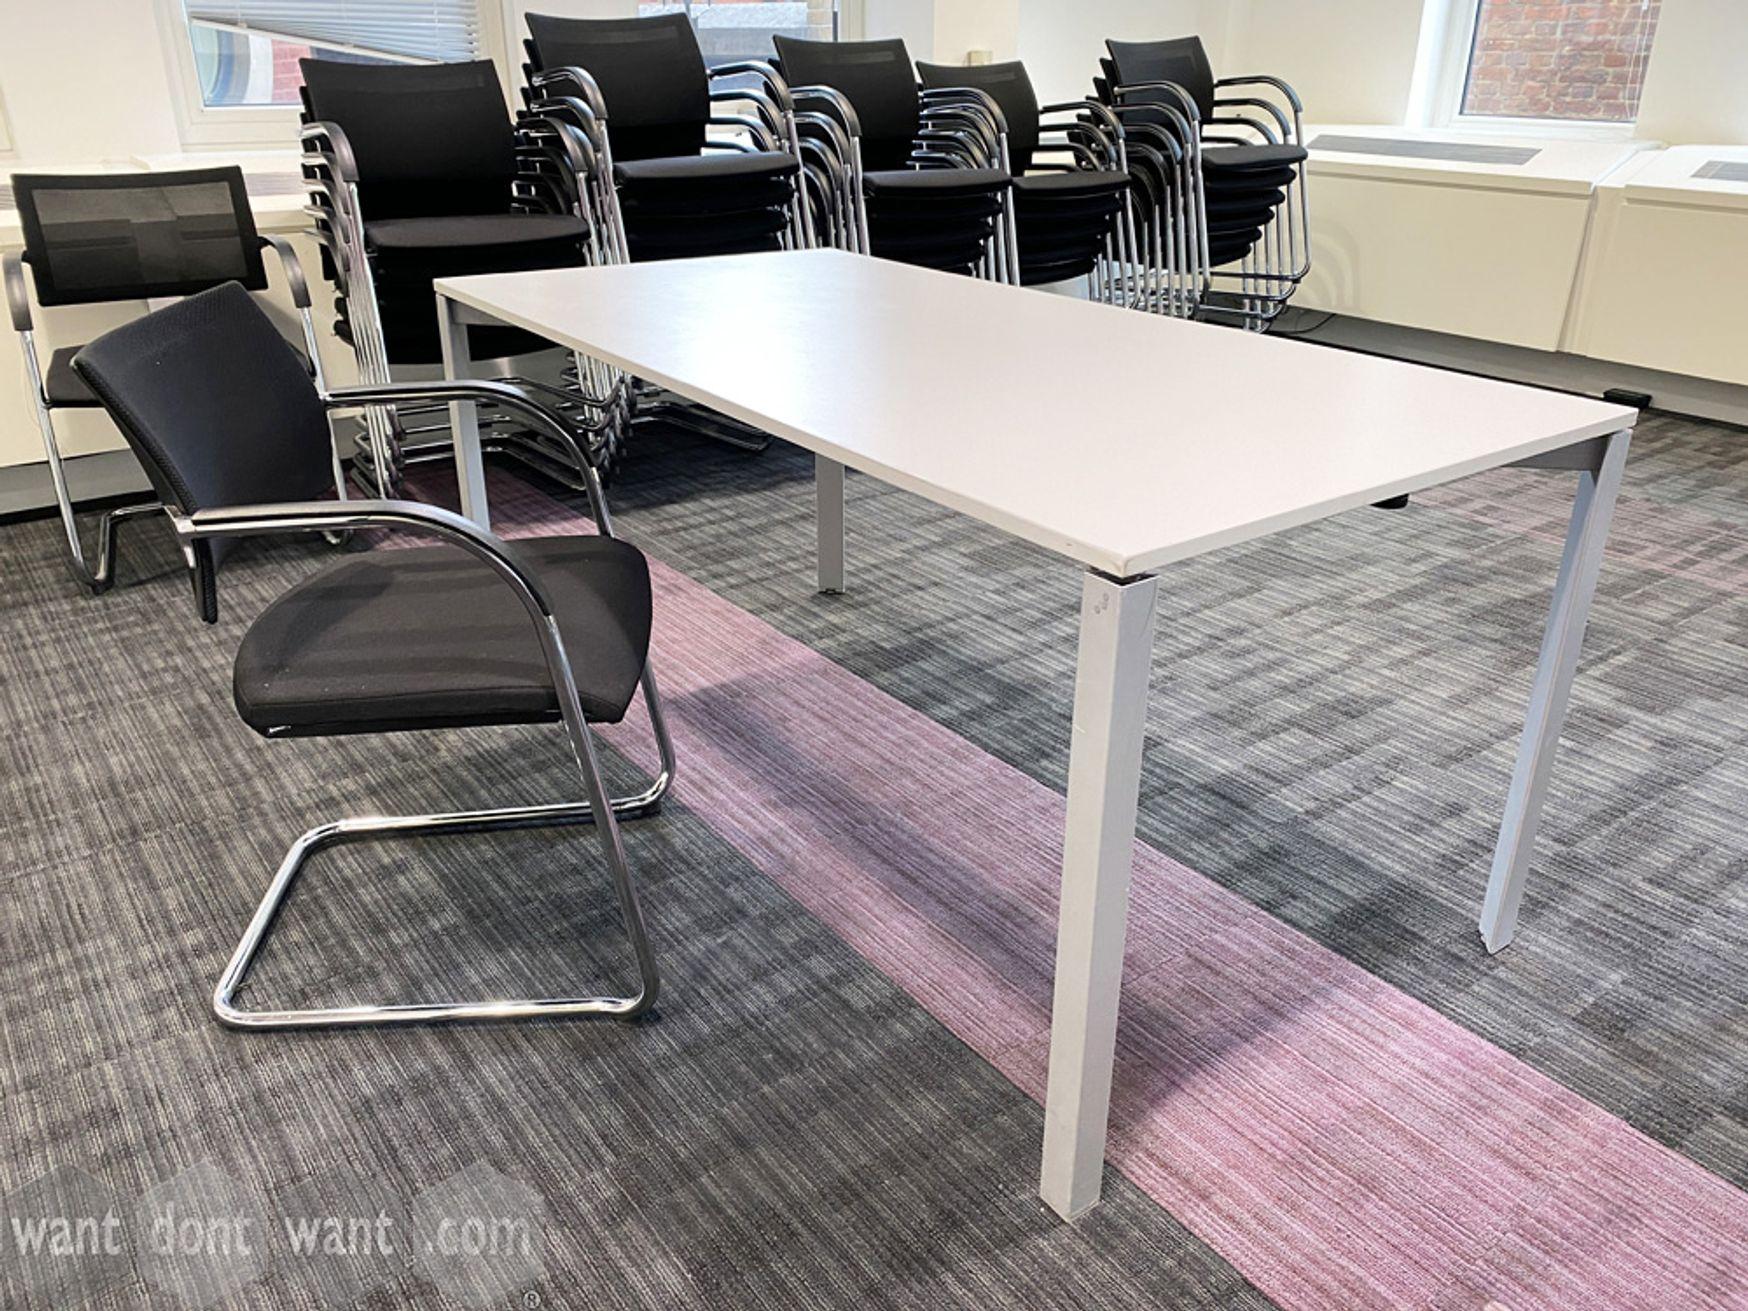 Used 'Bene' white folding frame tables 1600mm w x 800mm deep.